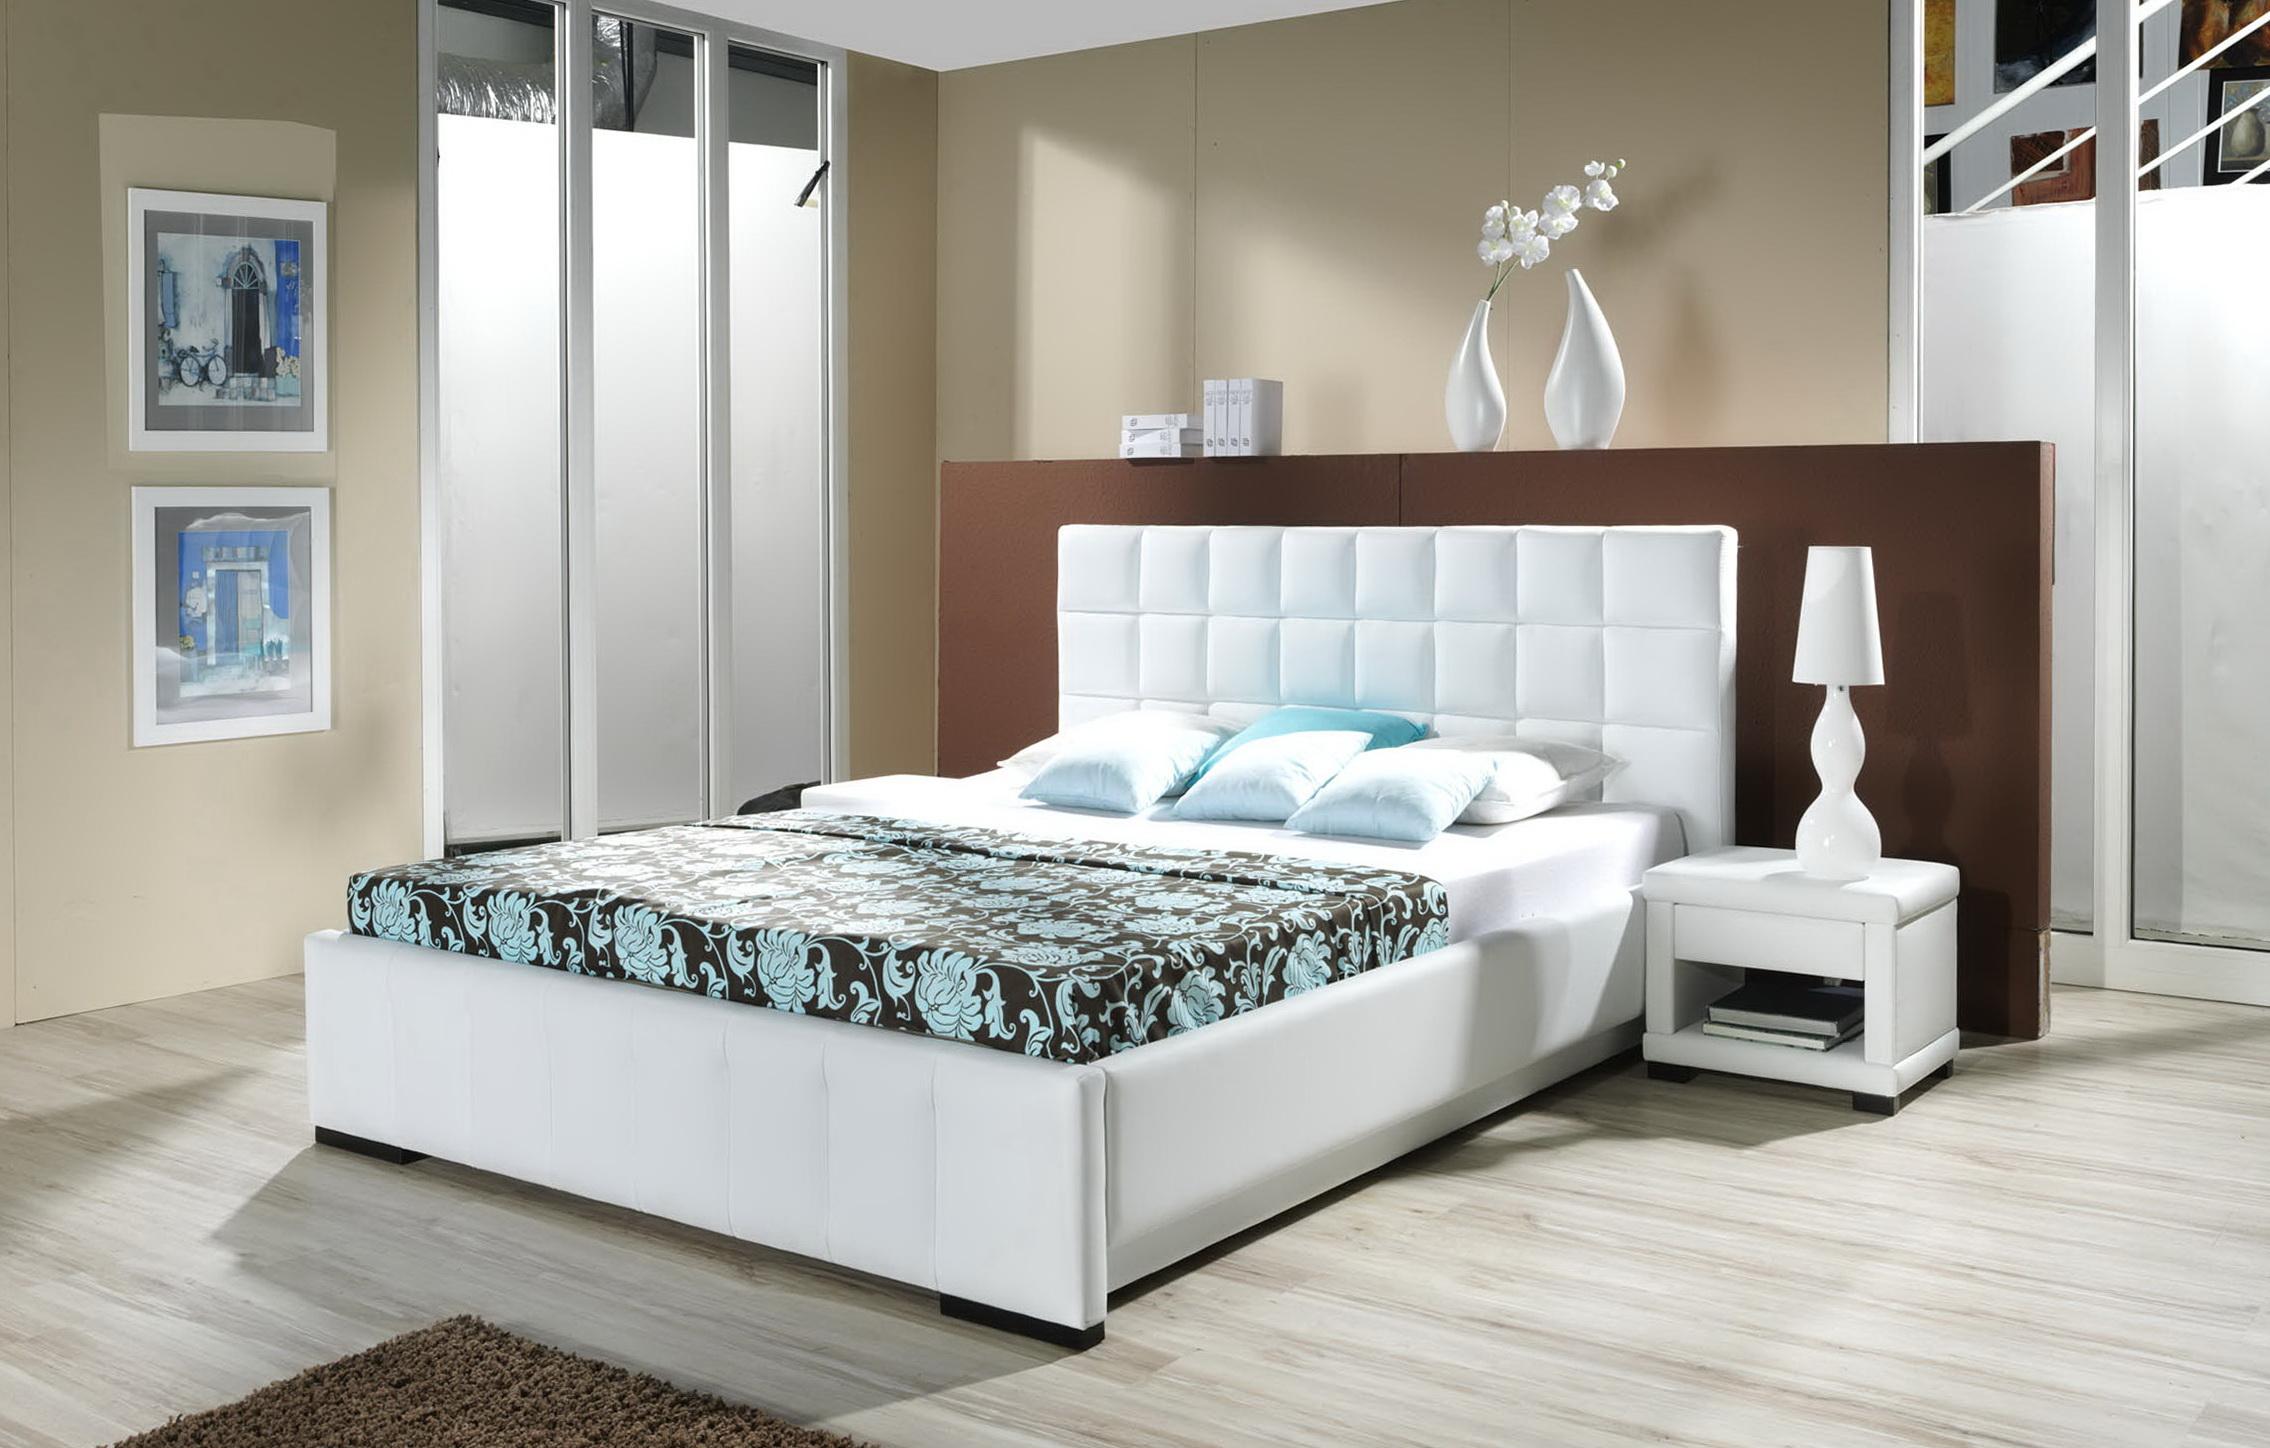 Teenage Girl Bedroom Ideas Black And White